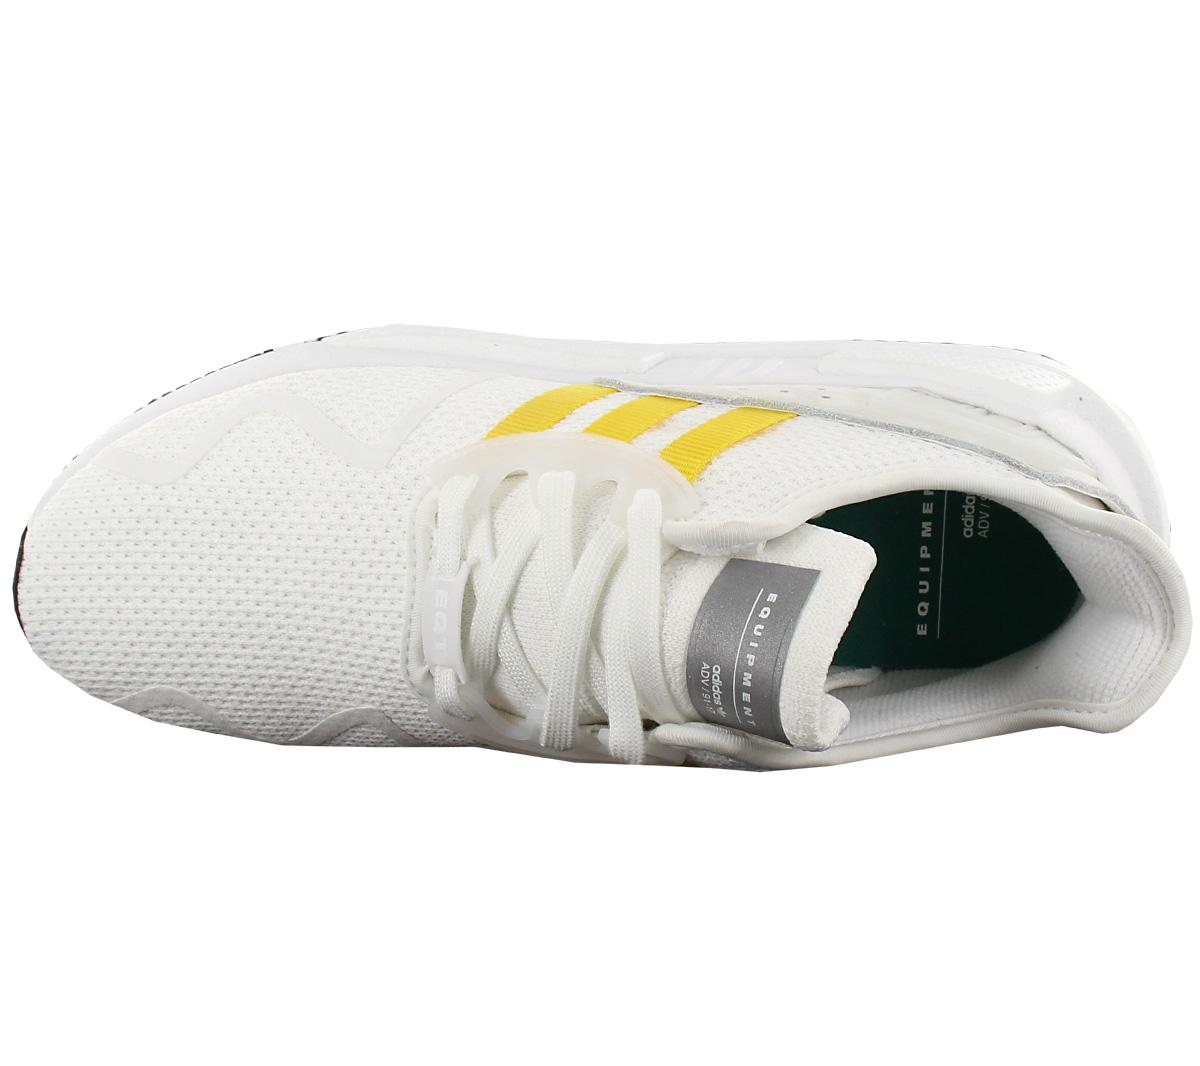 Details zu NEU adidas Originals EQT Equipment Cushion ADV Herren Schuhe Weiß Gelb CQ2375 SA